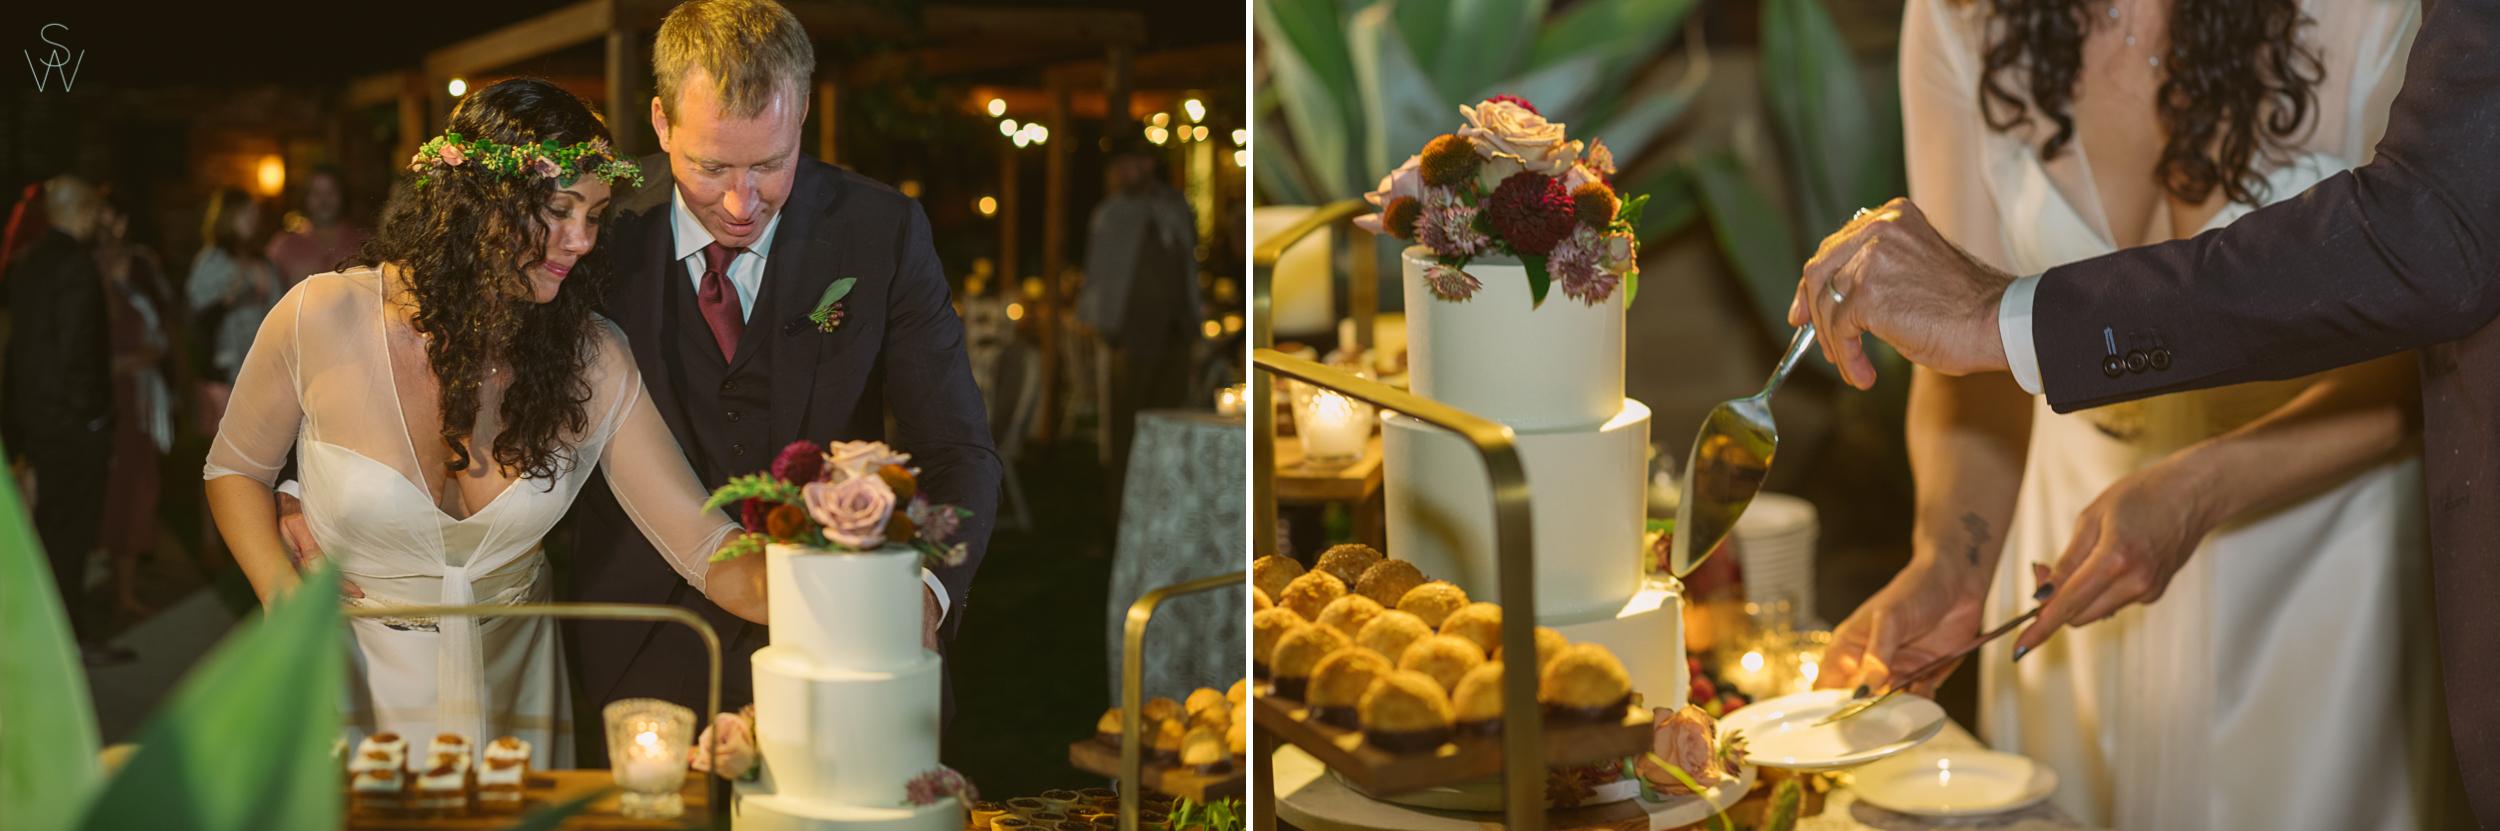 198Estancia.Shewanders.Wedding.cake.cutting.Photography.JPG